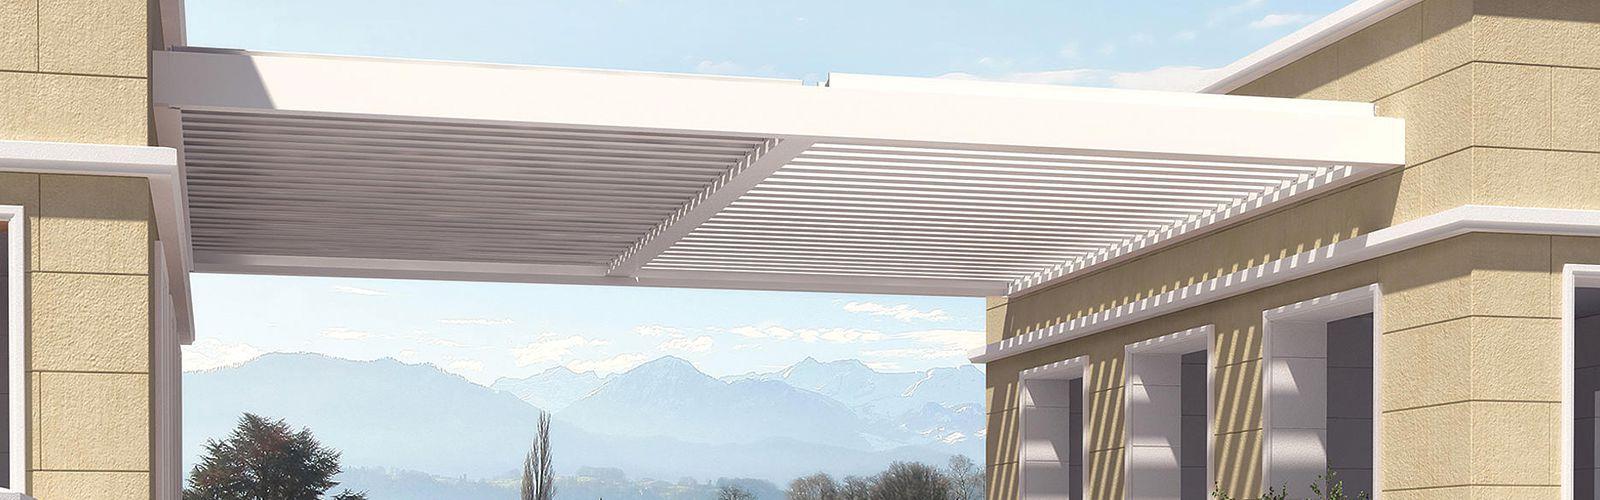 pavillon zimmermann sonnenschutzsysteme berlin